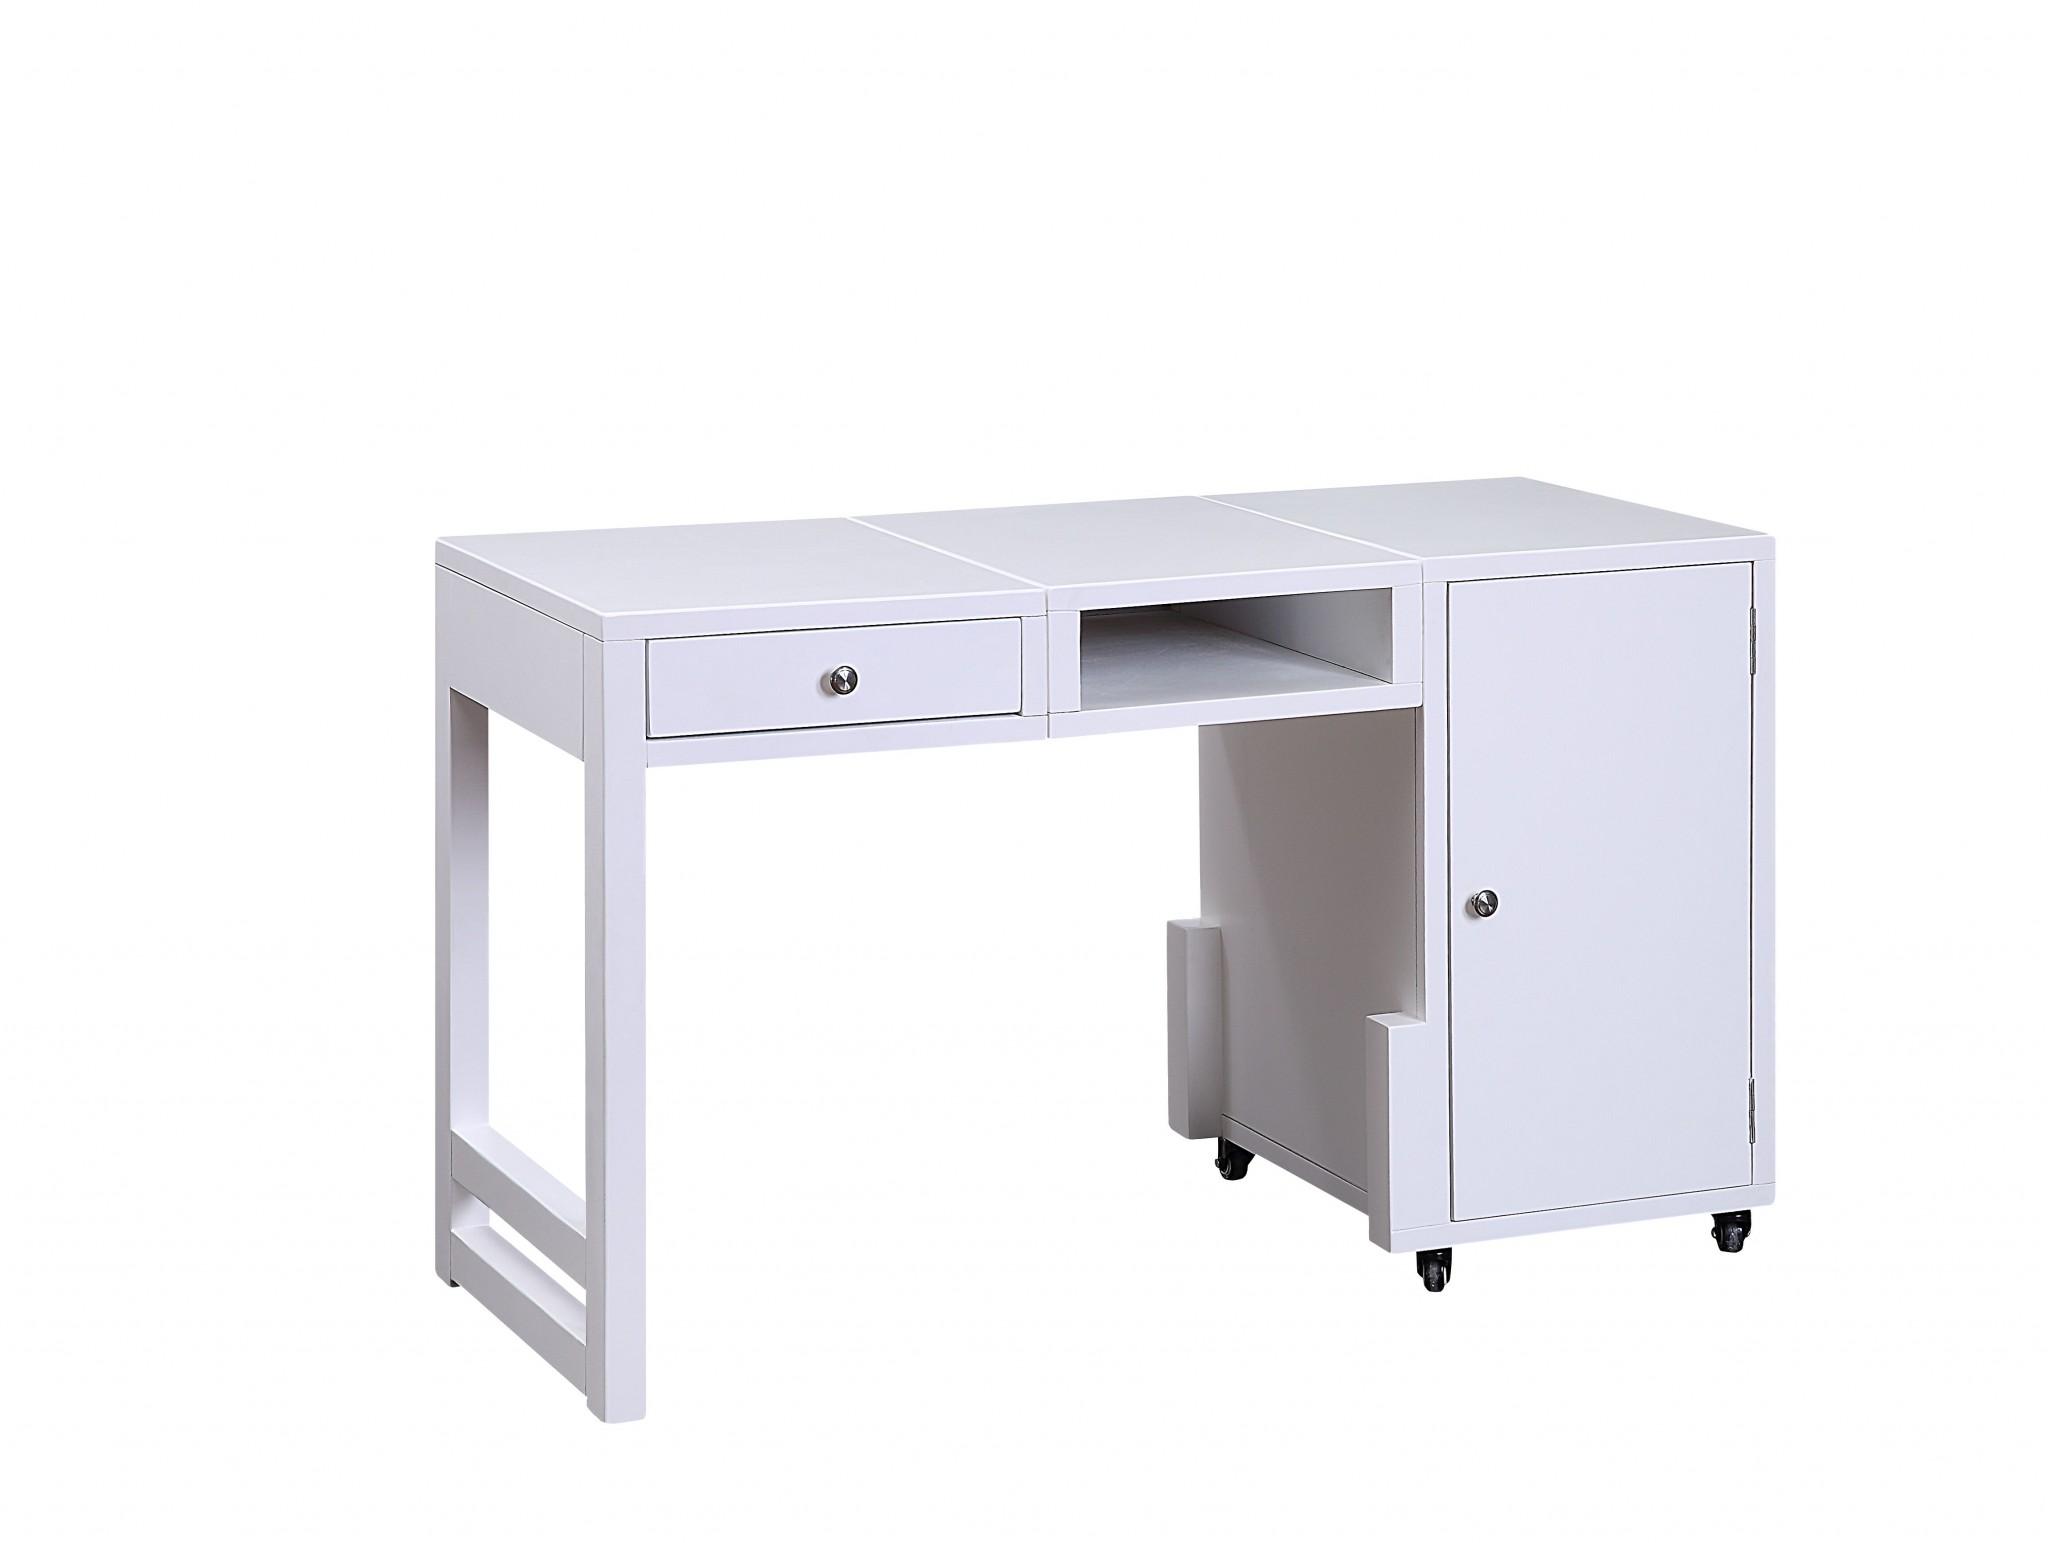 "20"" X 48"" X 30"" White Wood Veneer Desk (Convertible)"